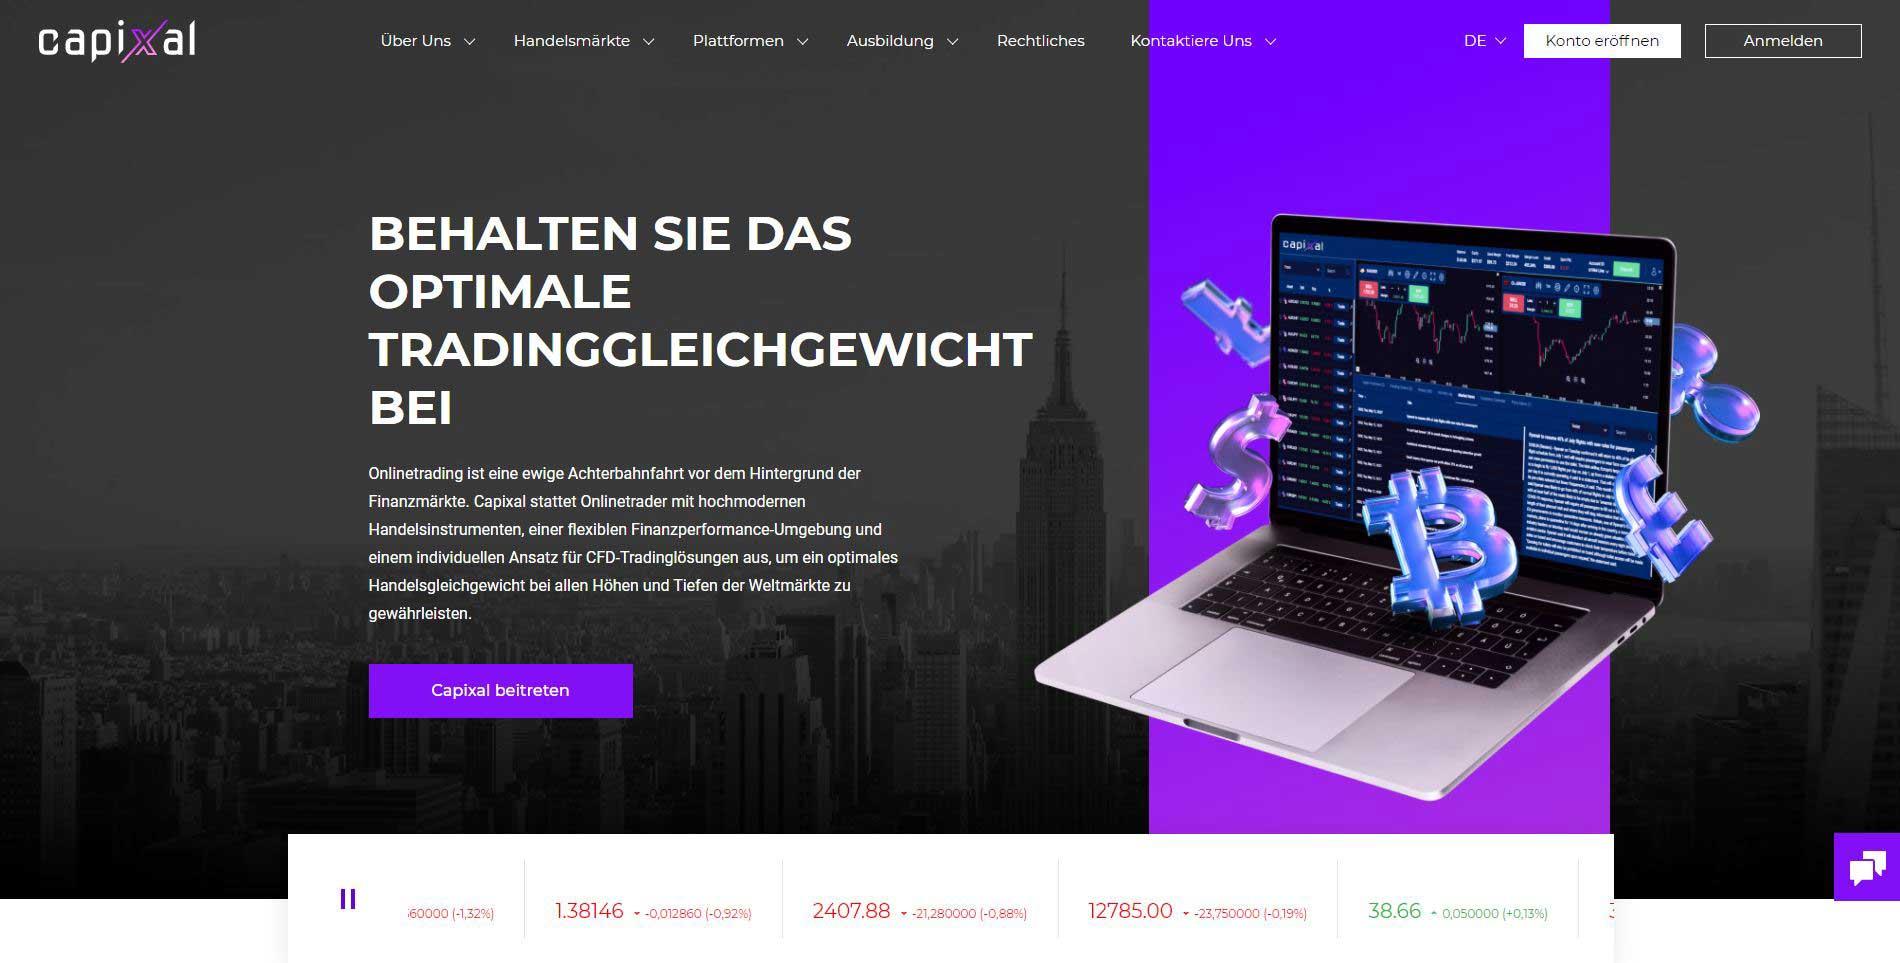 Capixal.com Broker Webseite Test